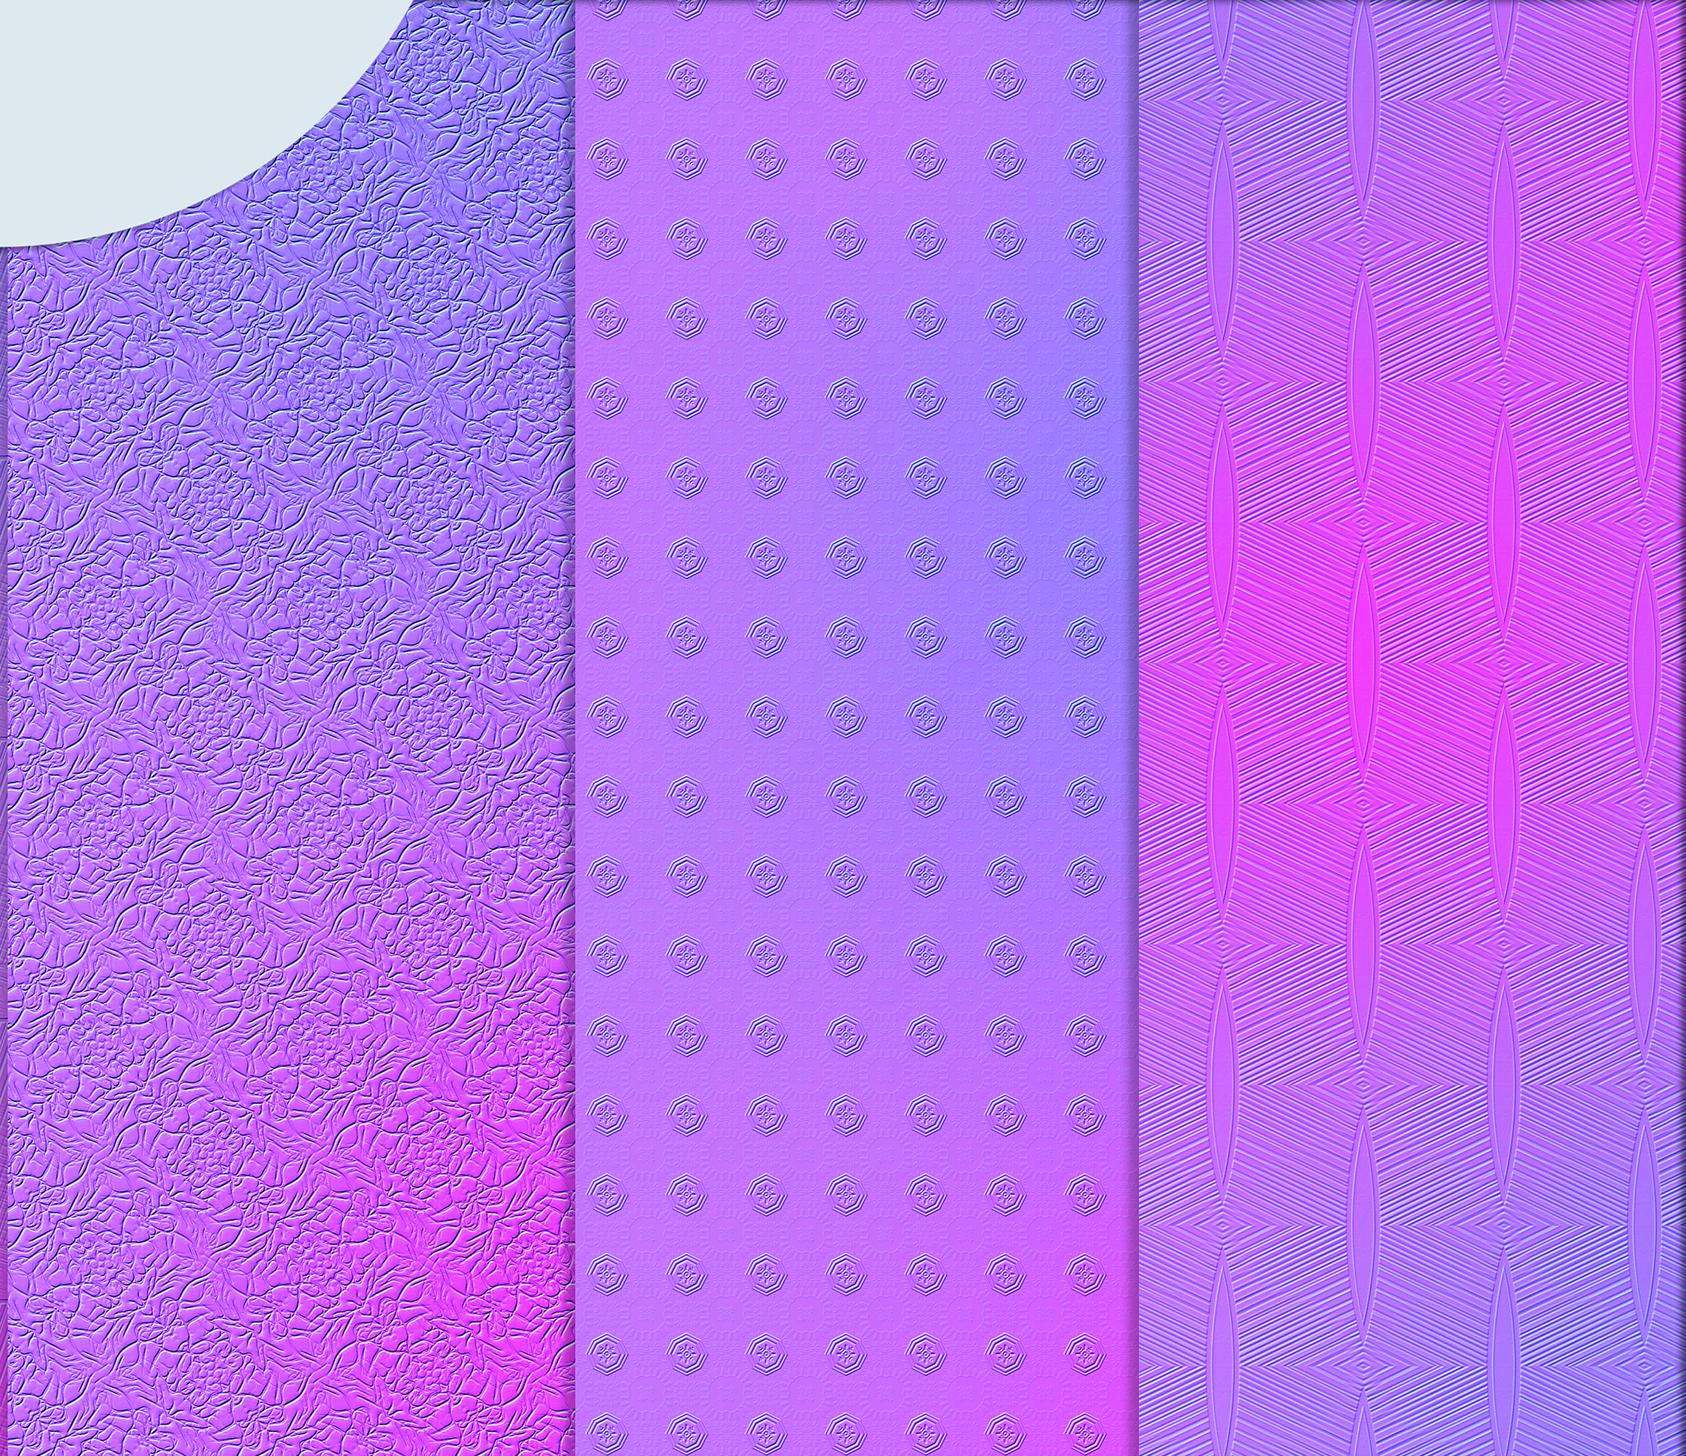 Purple-blue abstract textures, Digital Scrapbook Paper example image 4